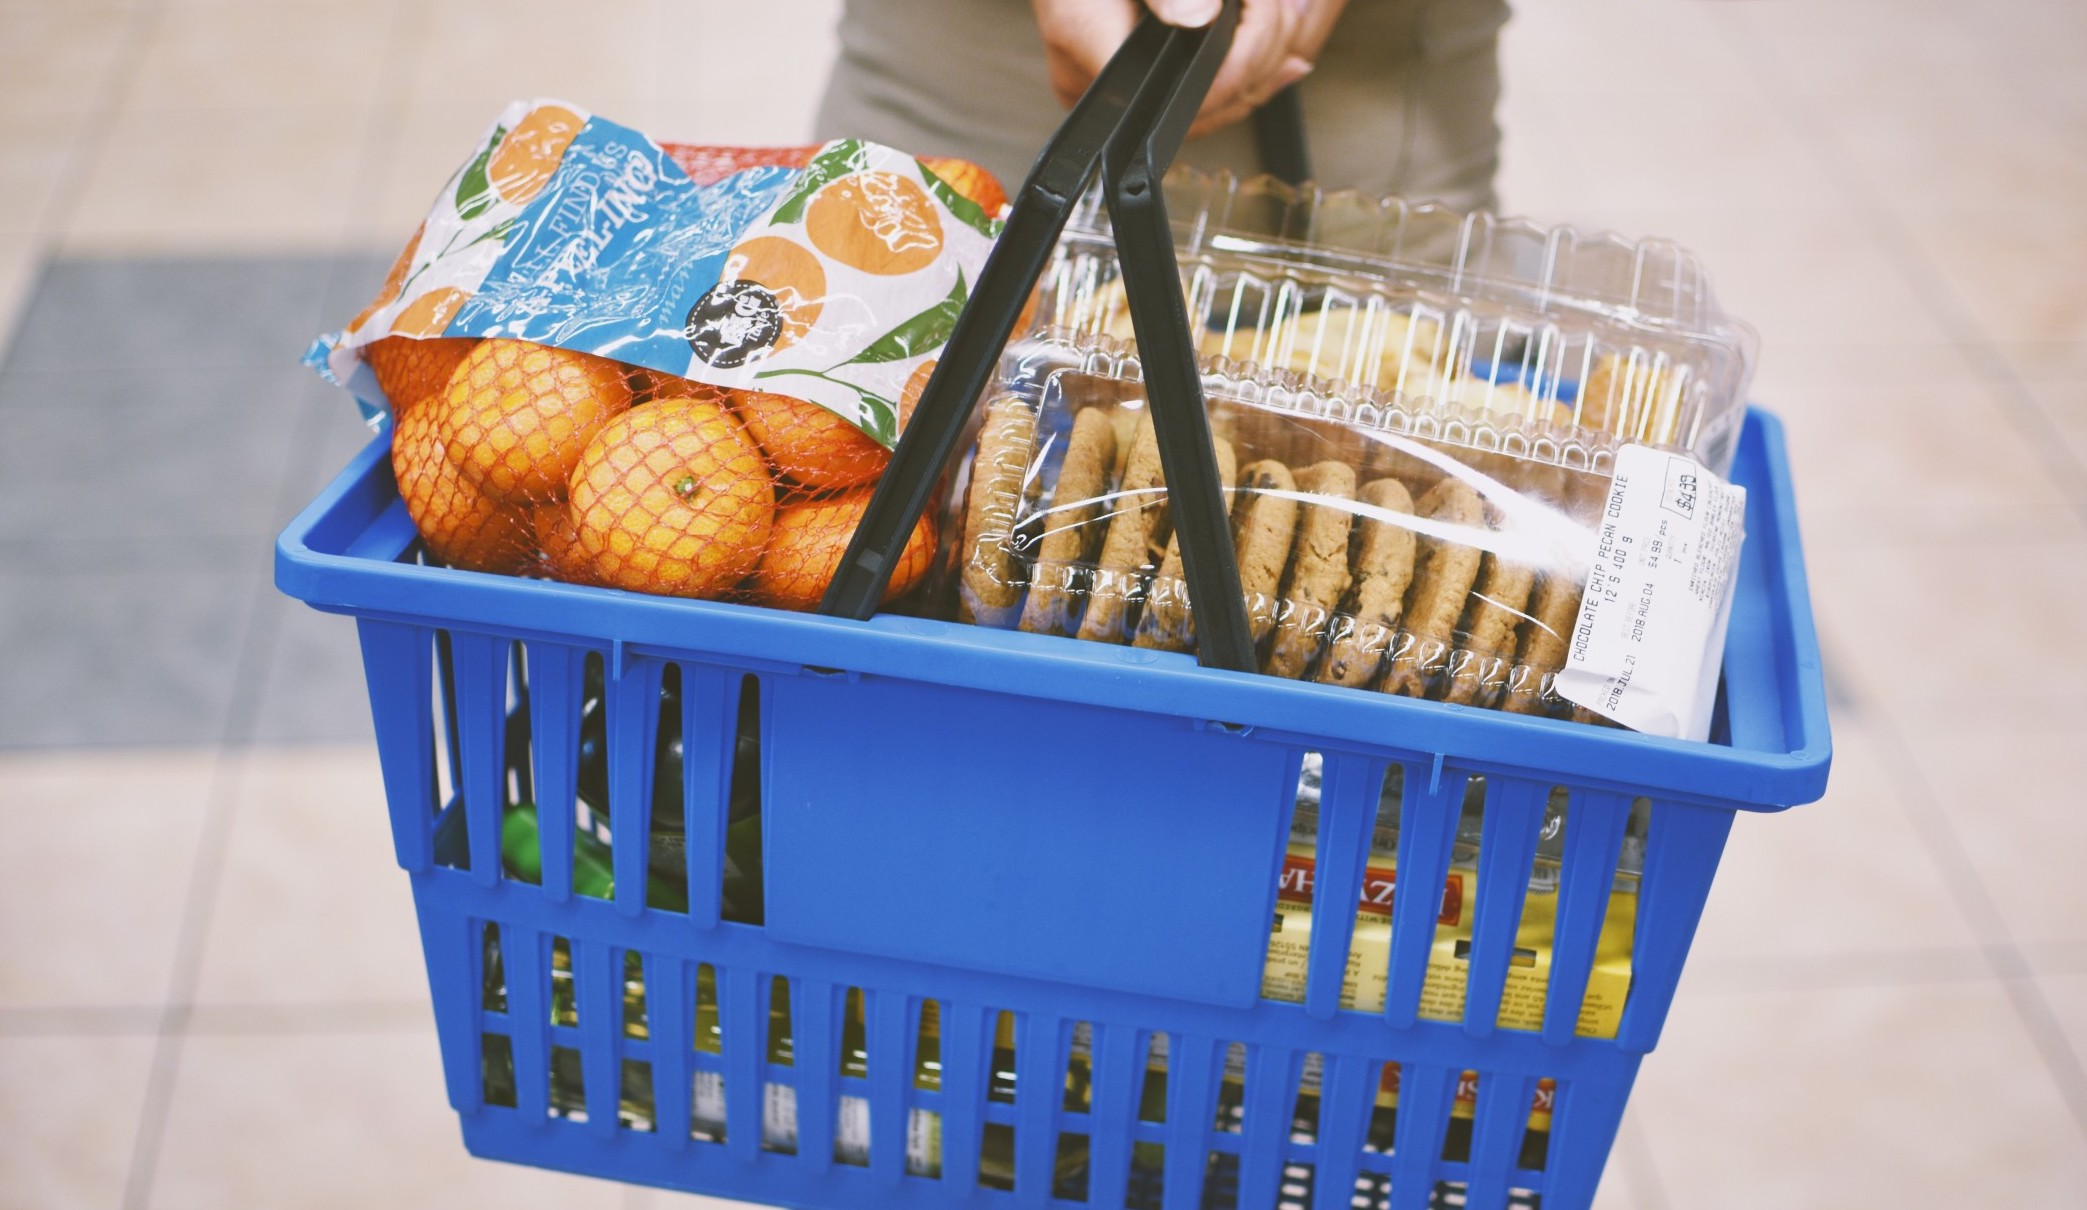 foodbanks uk initiatives during coronavirus